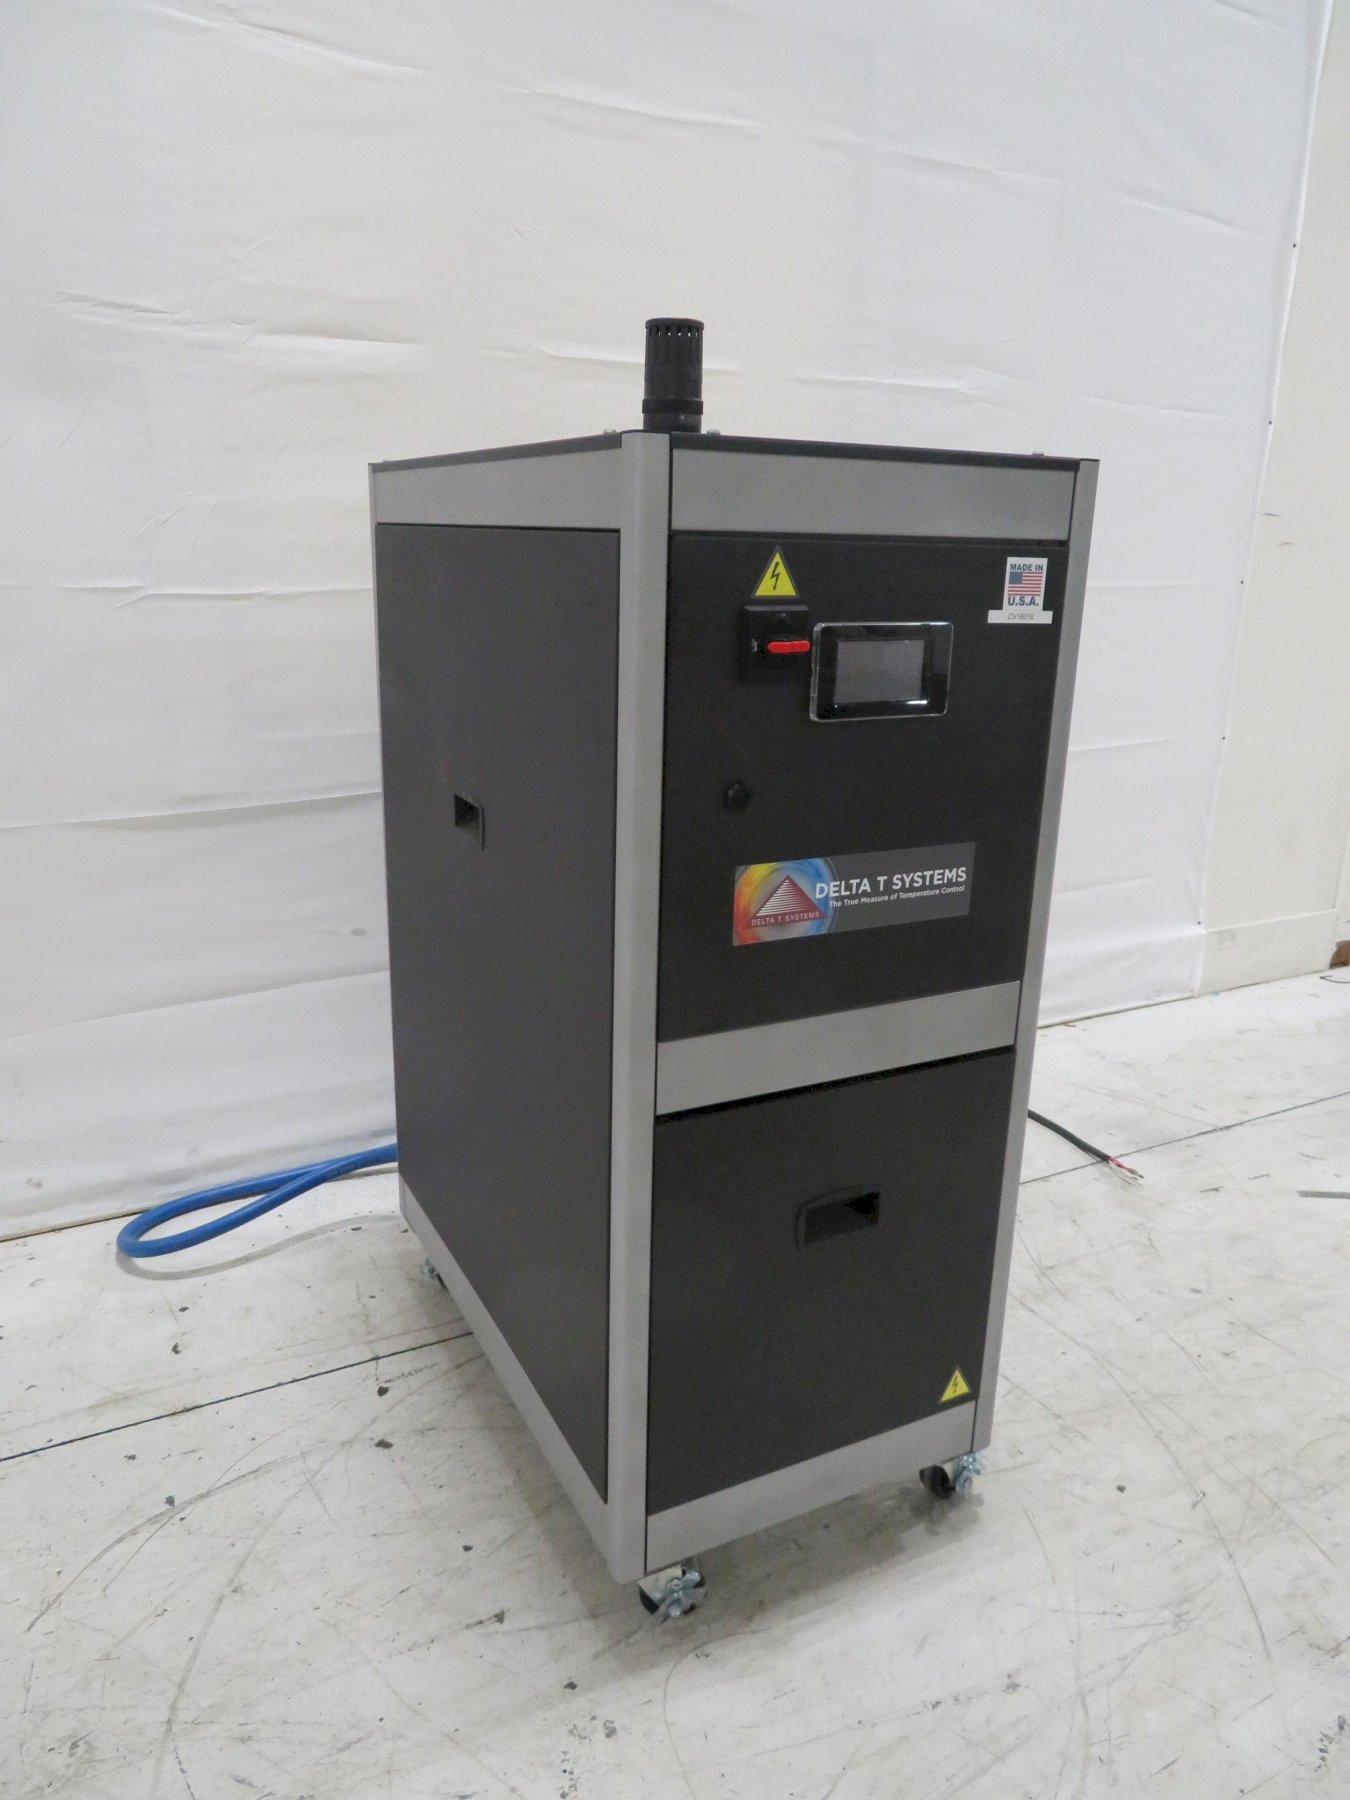 Delta T Used VSP-003 Portable Water Chiller, 3kw, 1hp, 230V, Yr. 2017